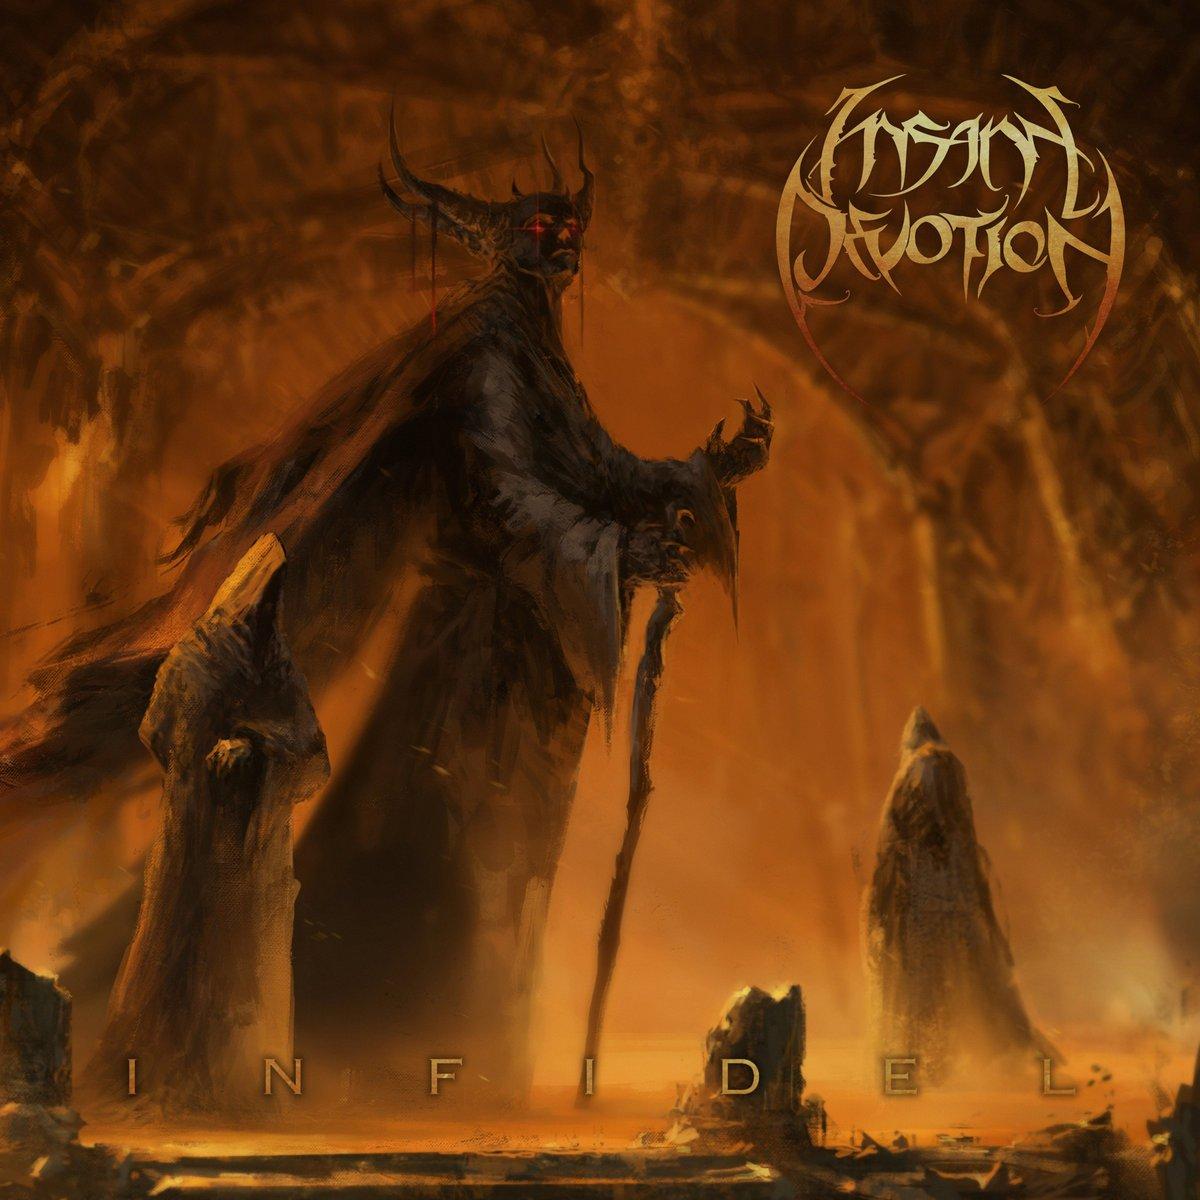 Insande Devotion – Infidel